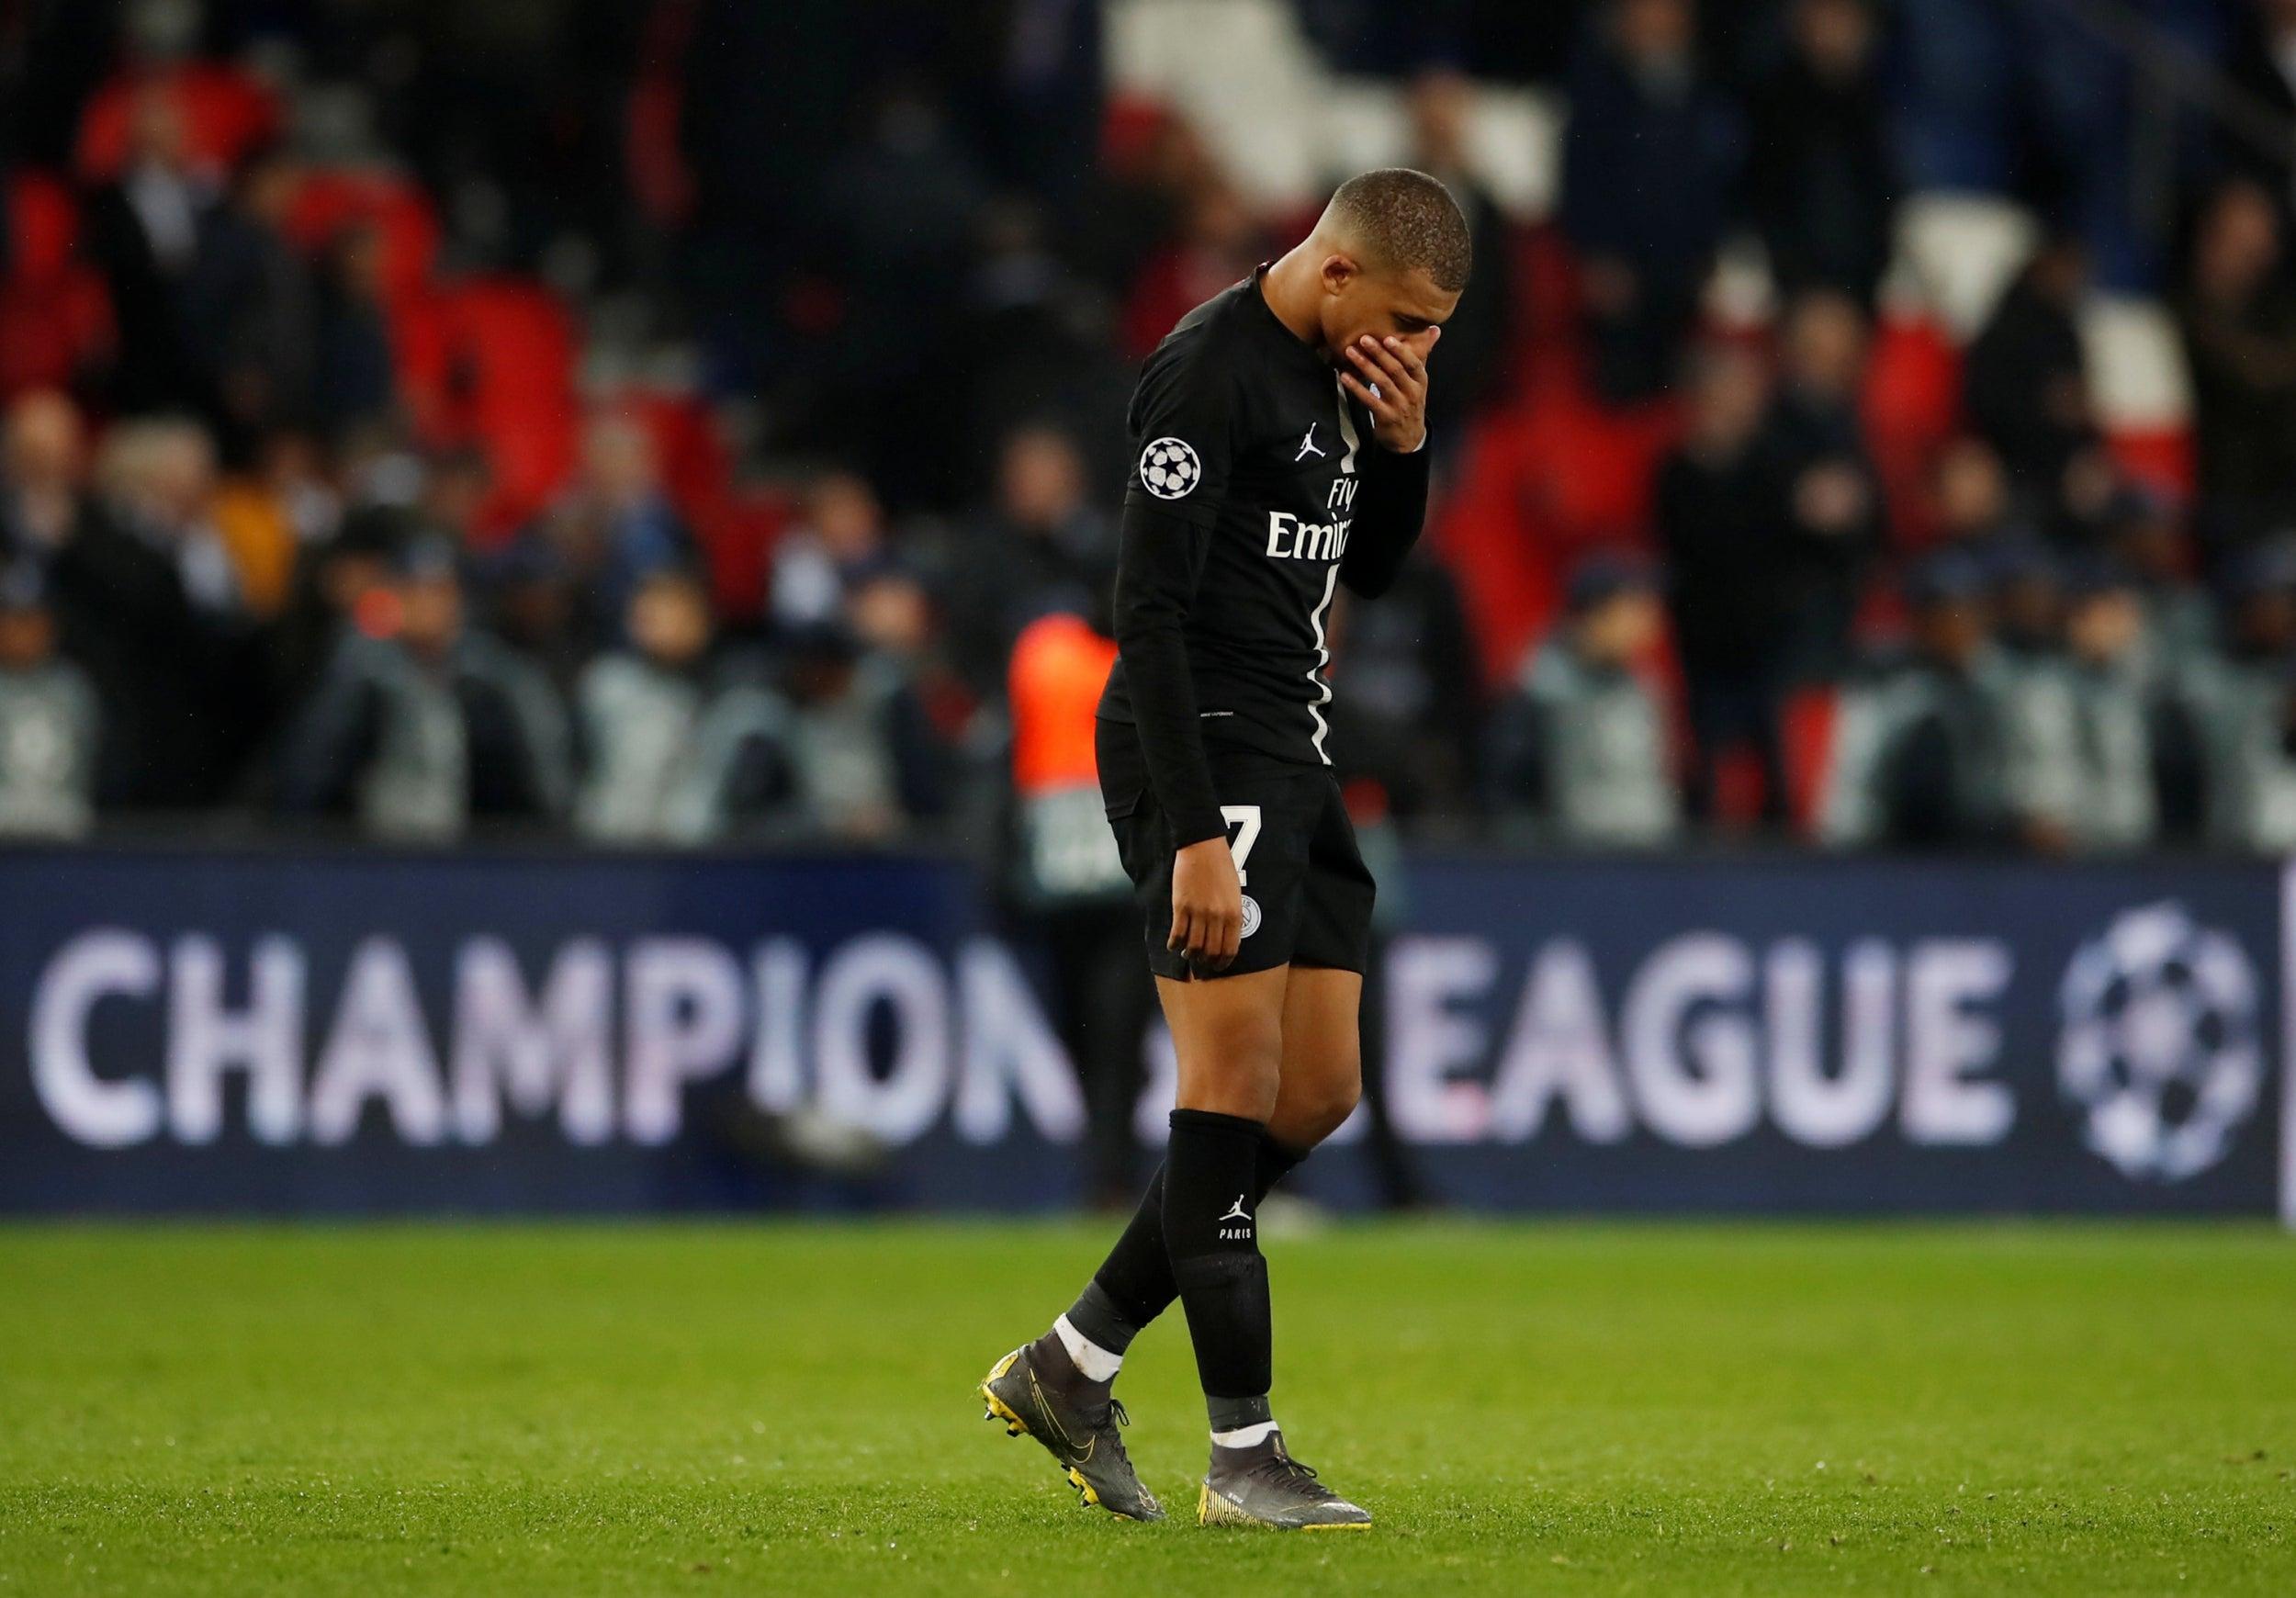 Man Utd Vs Psg: PSG Leave Pathetic Champions League Legacy After